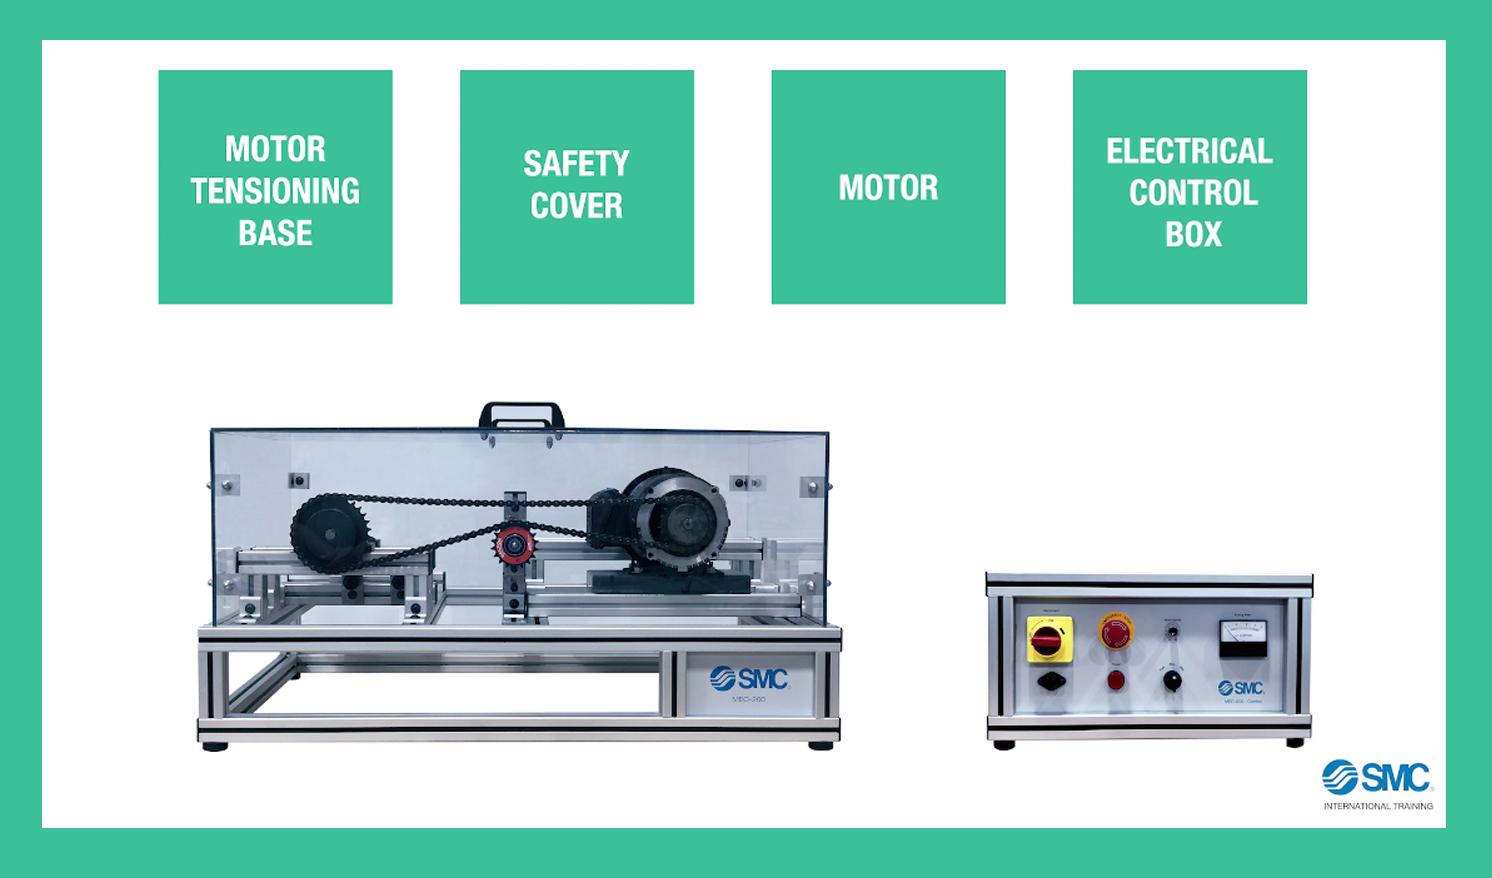 MEC-200 - Mechanical training system